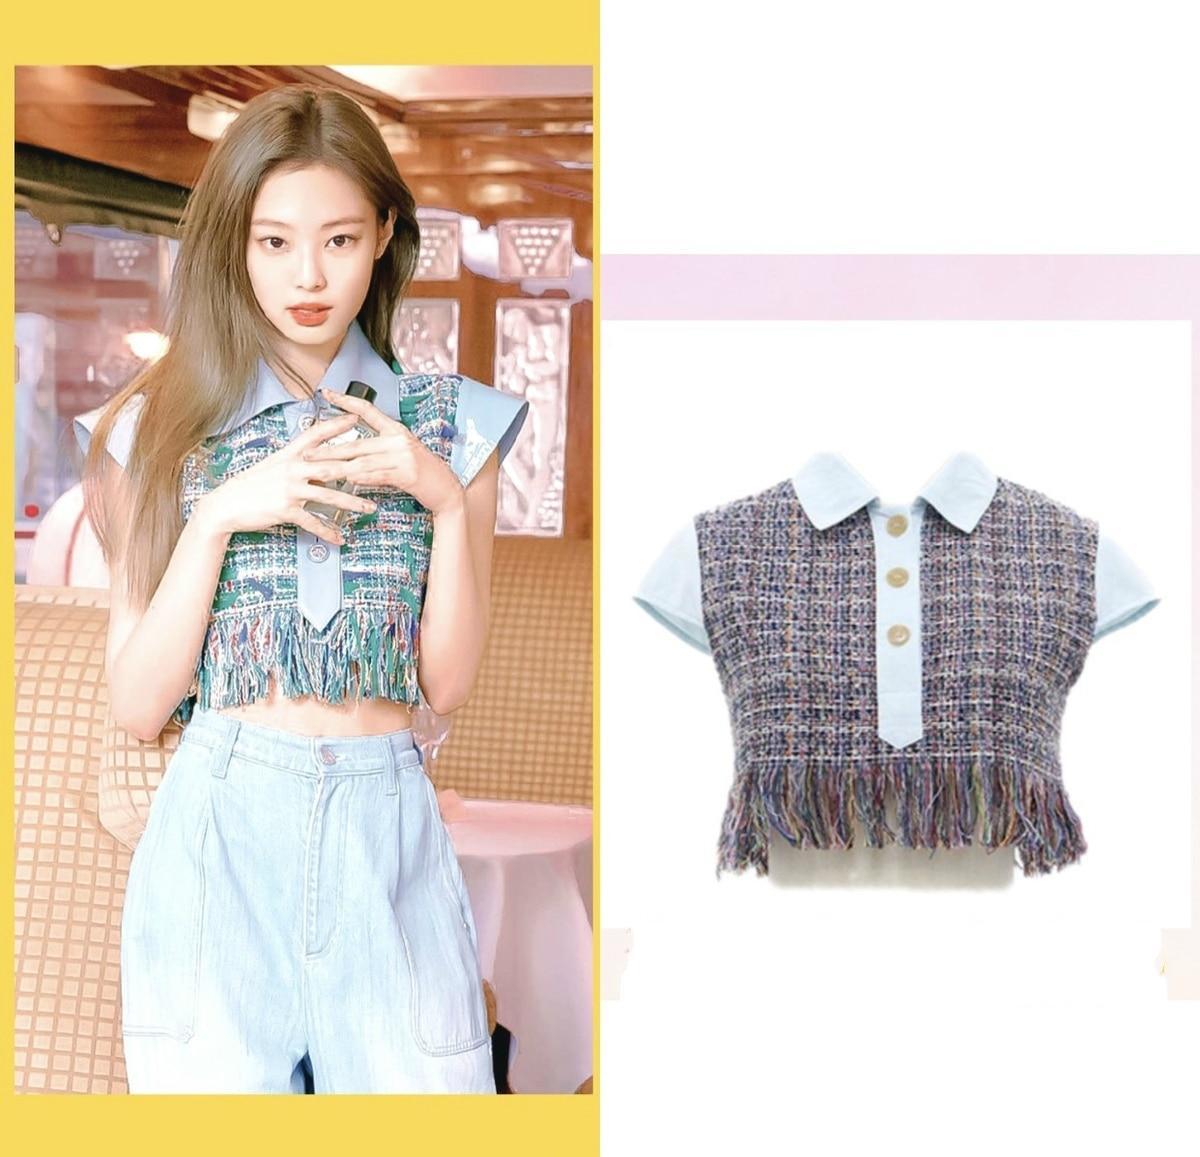 Kpop blackpink jennie o mesmo tweed franjas t camisa das mulheres streetwear kawaii camiseta coreano harajuku vento manga curta tshirt